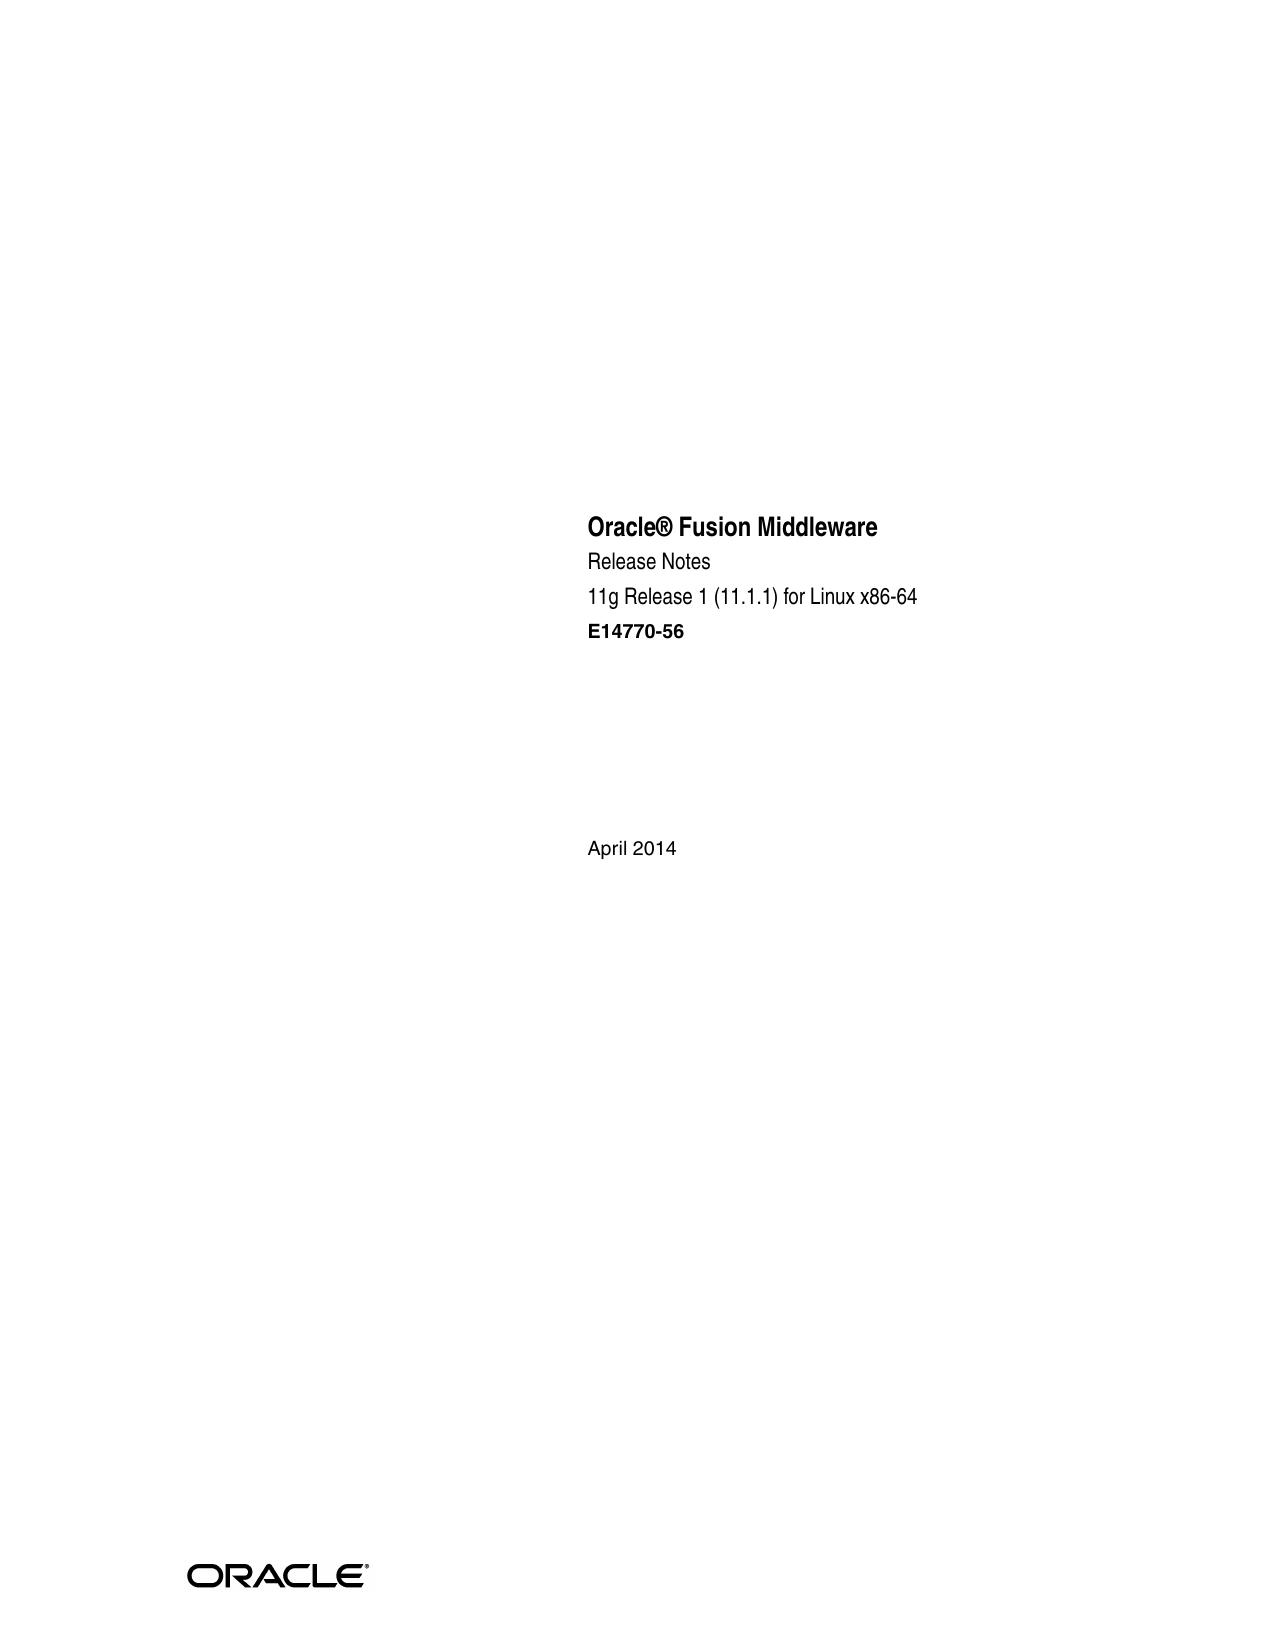 Oracle® Fusion Middleware | manualzz com